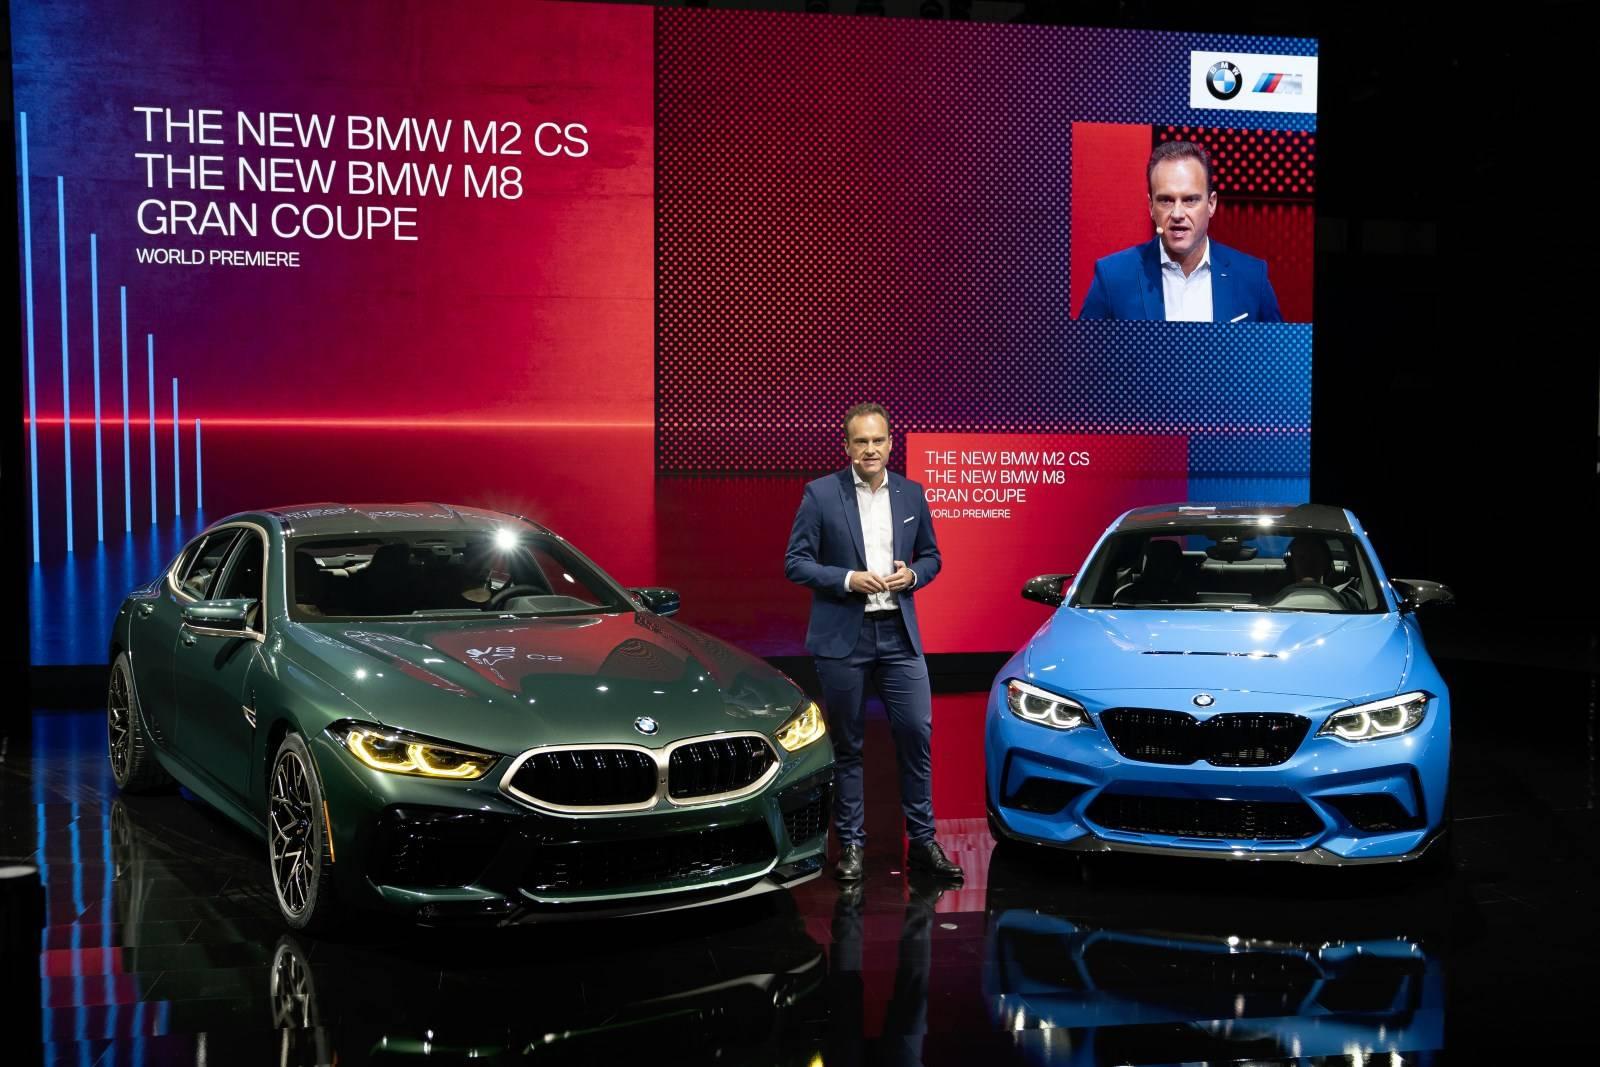 BMW M в Лос-Анджелесе: BMW M8 Gran Coupe иBMW M2 CS 1